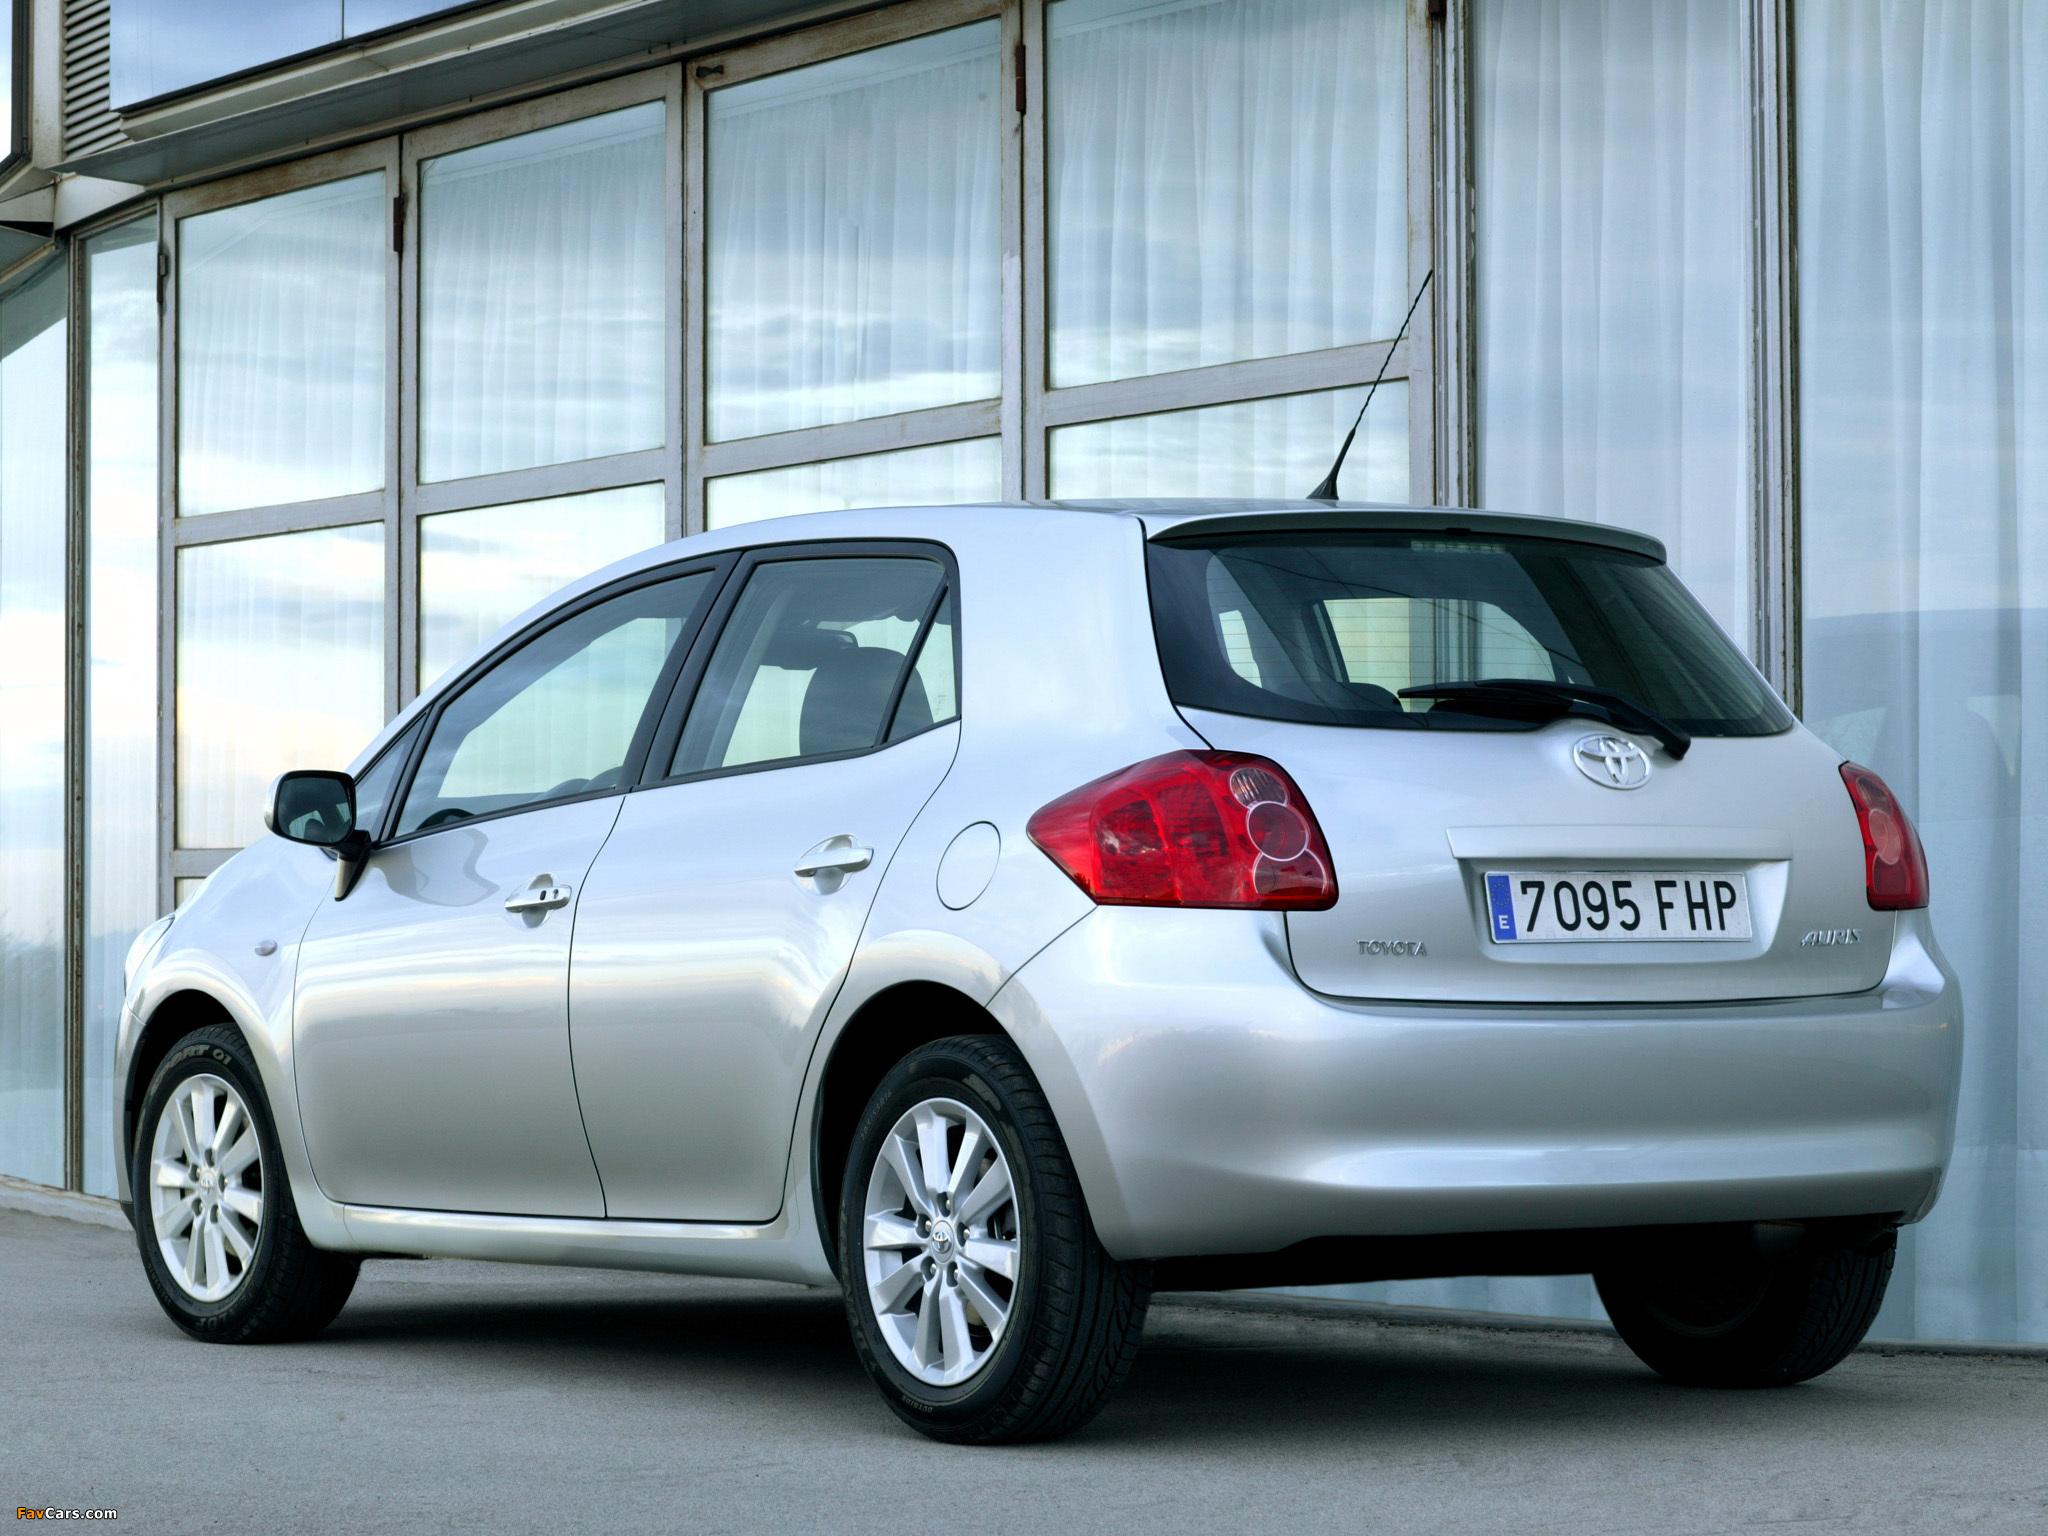 Toyota Аурис 1 6 технические характеристики #10